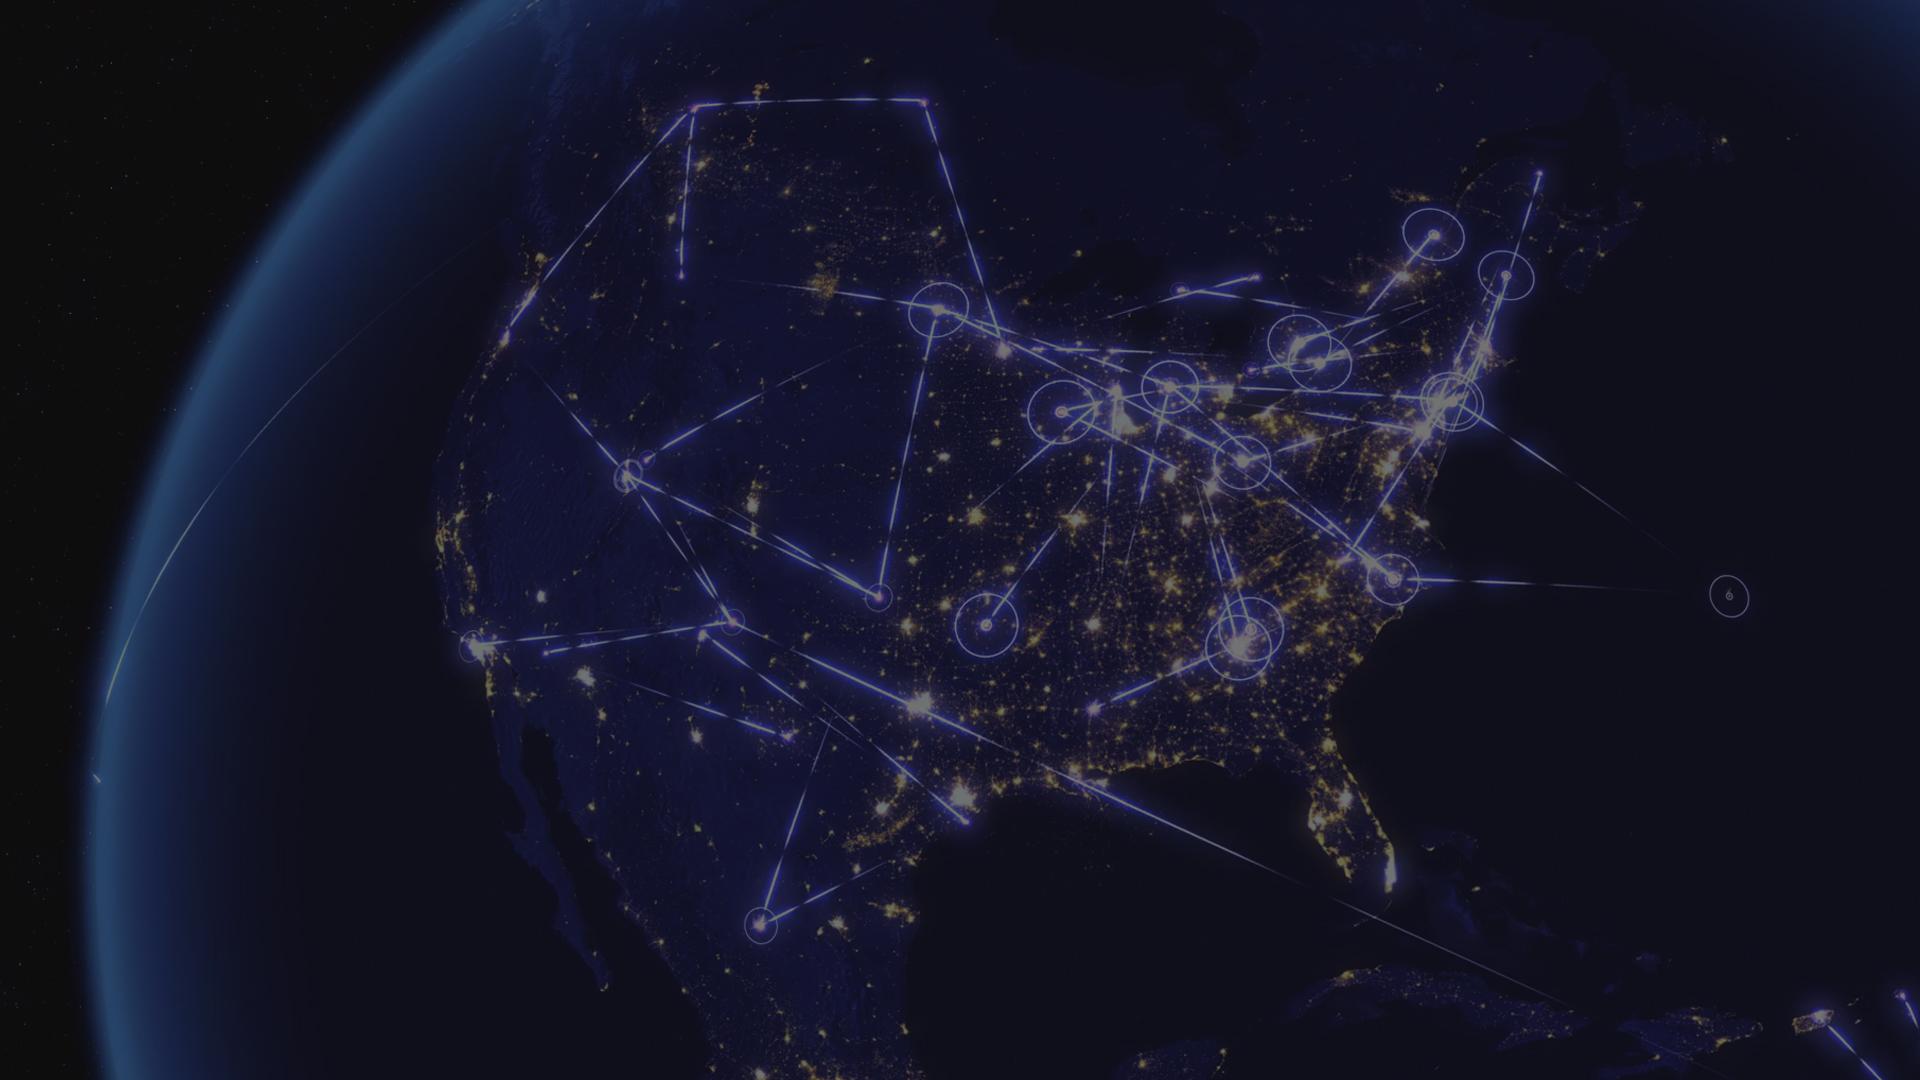 mclane global in houston texas import data :: brigtechteri ga